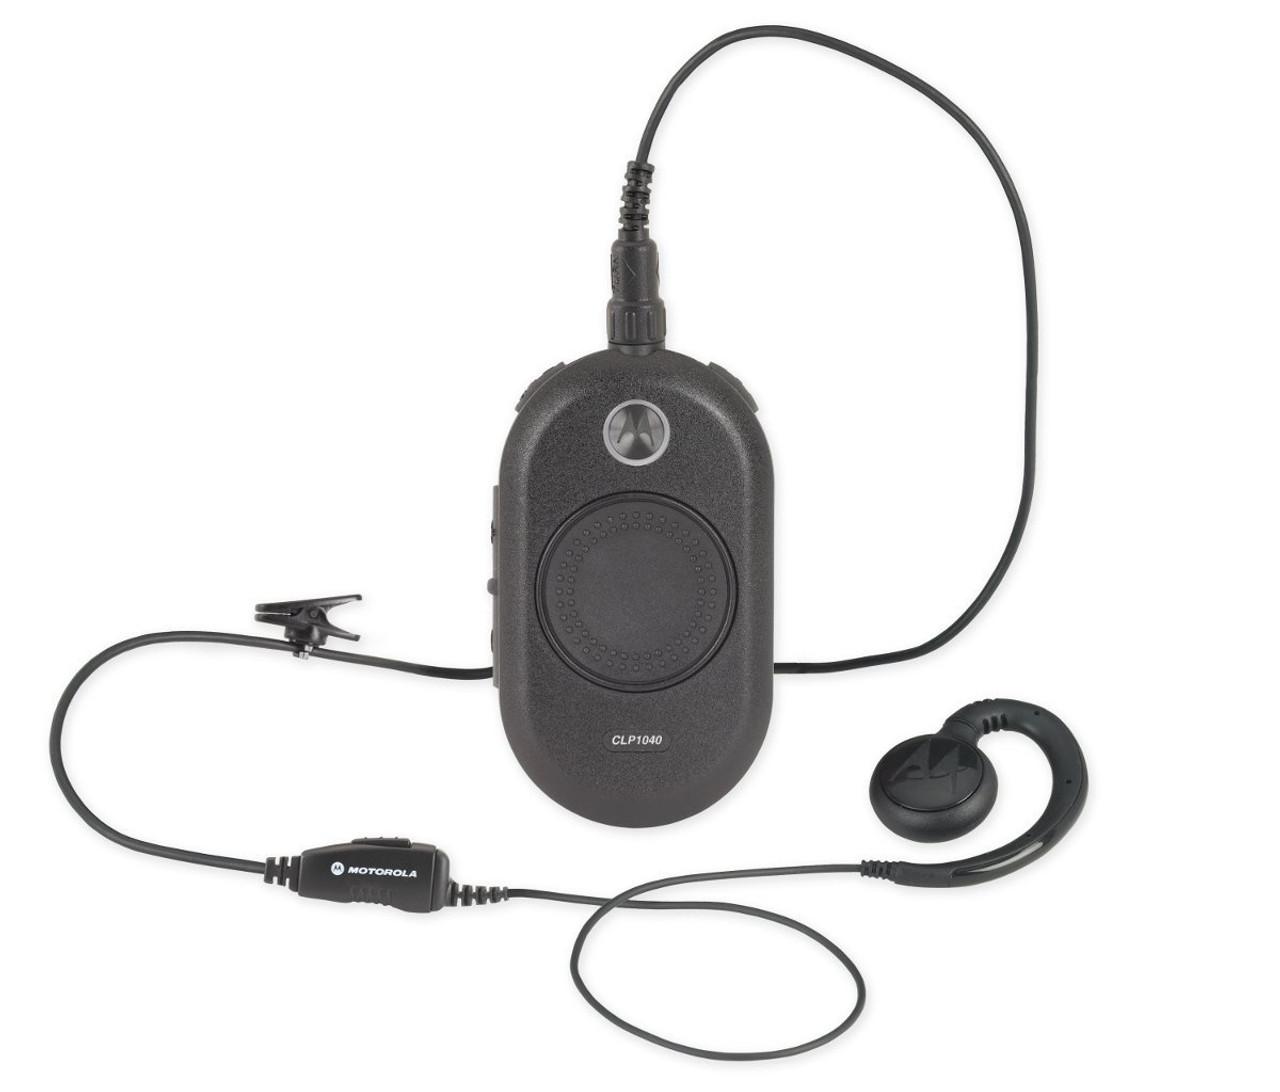 Motorola CLP1040 1 Watt 4 Channel UHF Two Way Radio